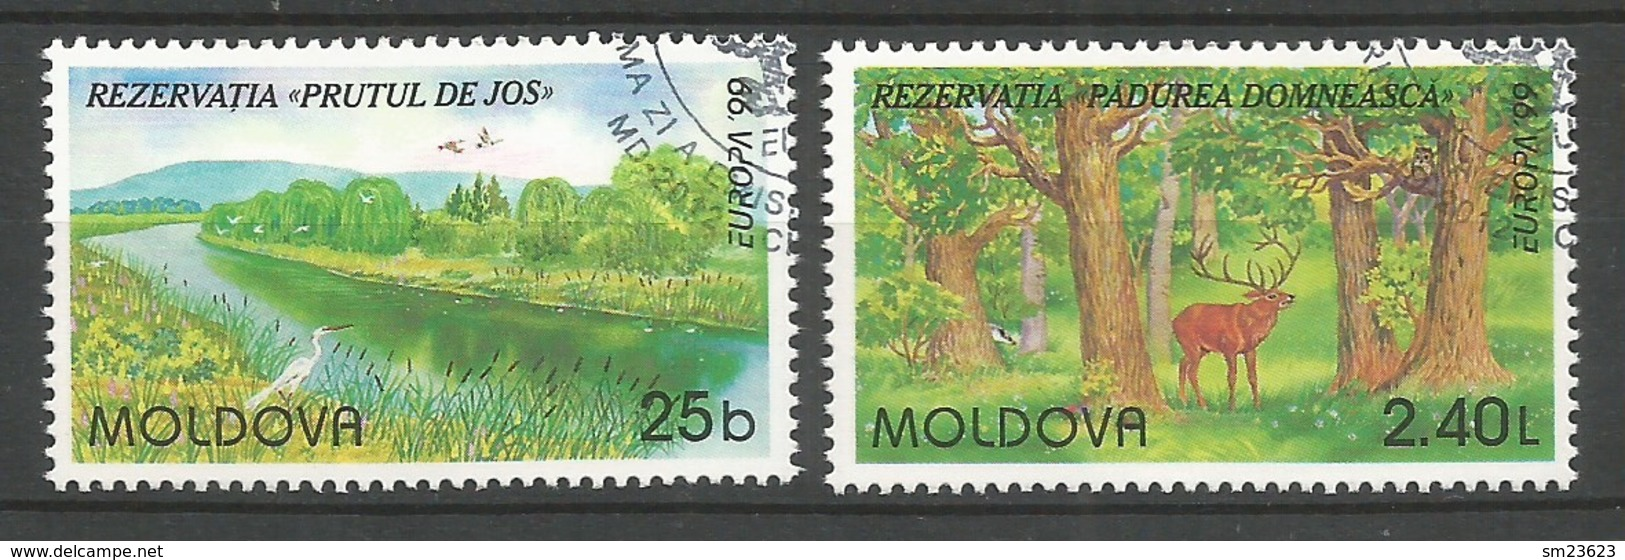 Moldawien / Moldova 1999 Mi.Nr. 305 / 306 , EUROPA CEPT Natur- Und Nationalparks - Gestempelt / Fine Used / (o) - 1999